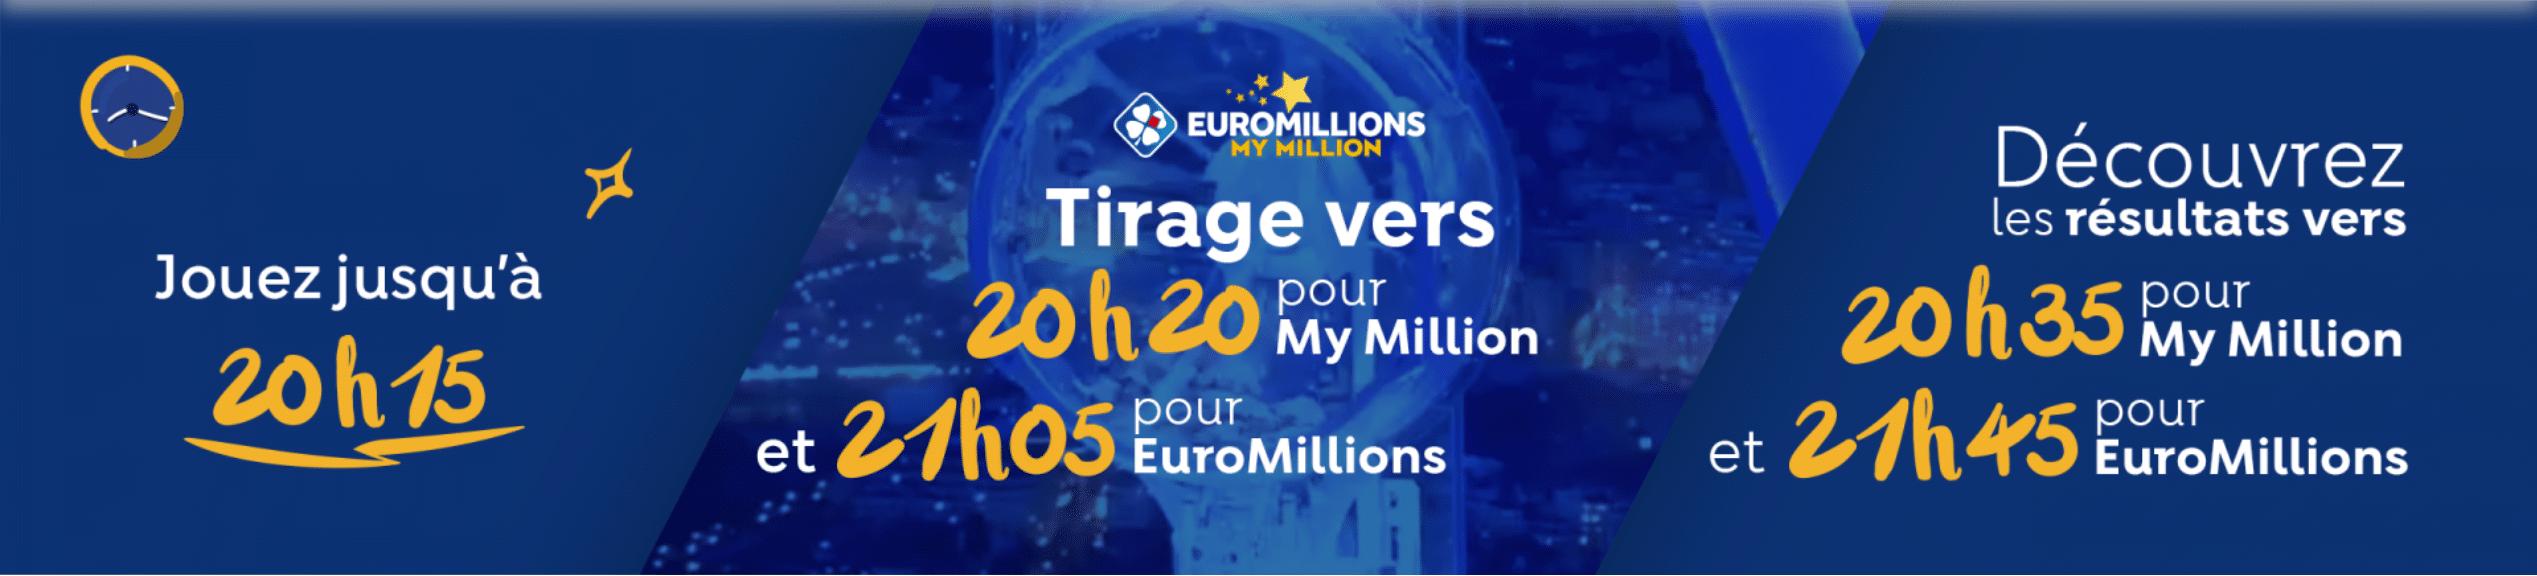 horaire eurommillions